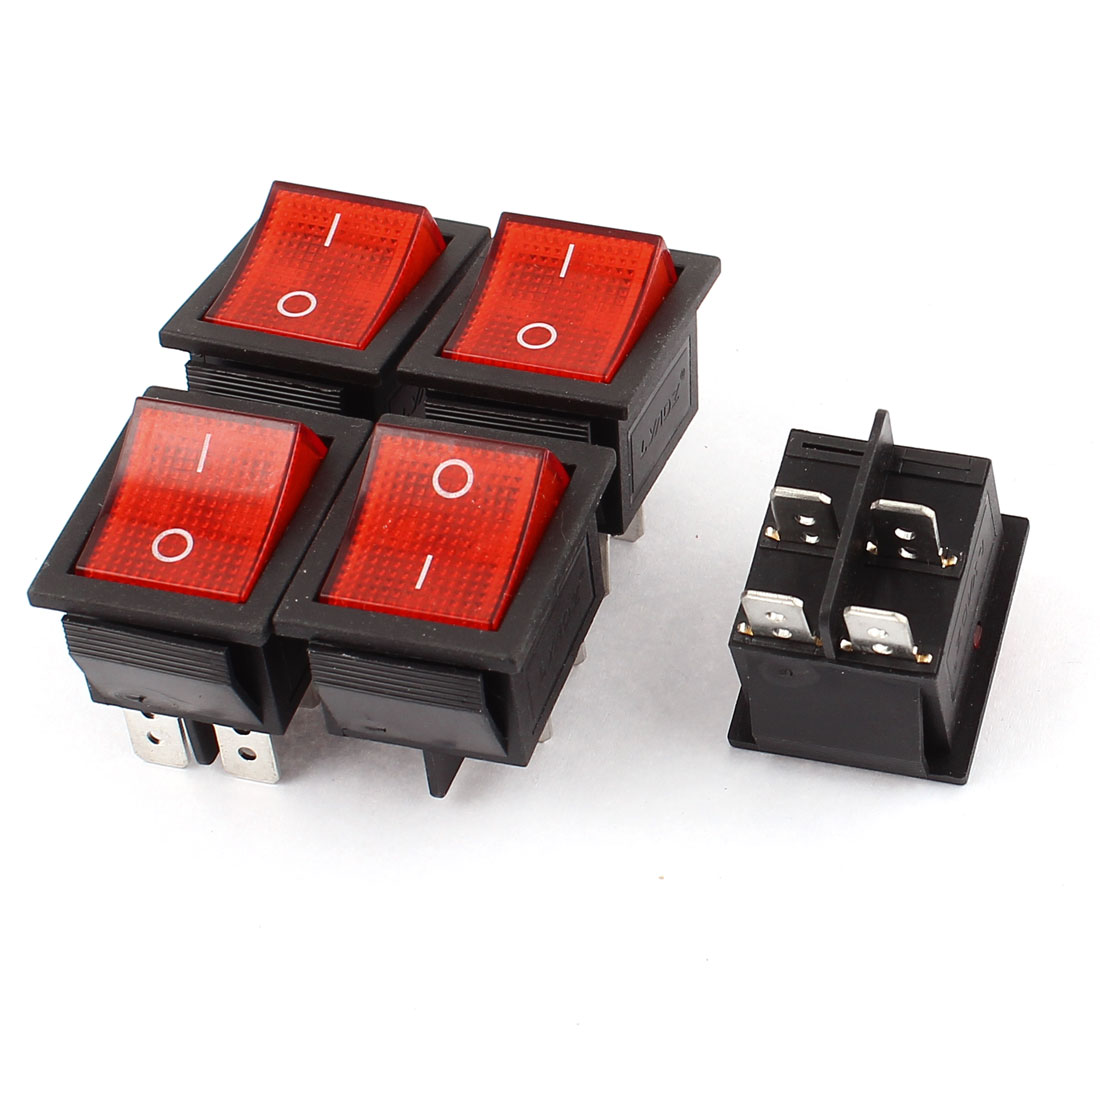 5PCS Red Lamp 4 Pins DPST On/Off Boat Rocker Switch AC 250V/16A 125V/20A